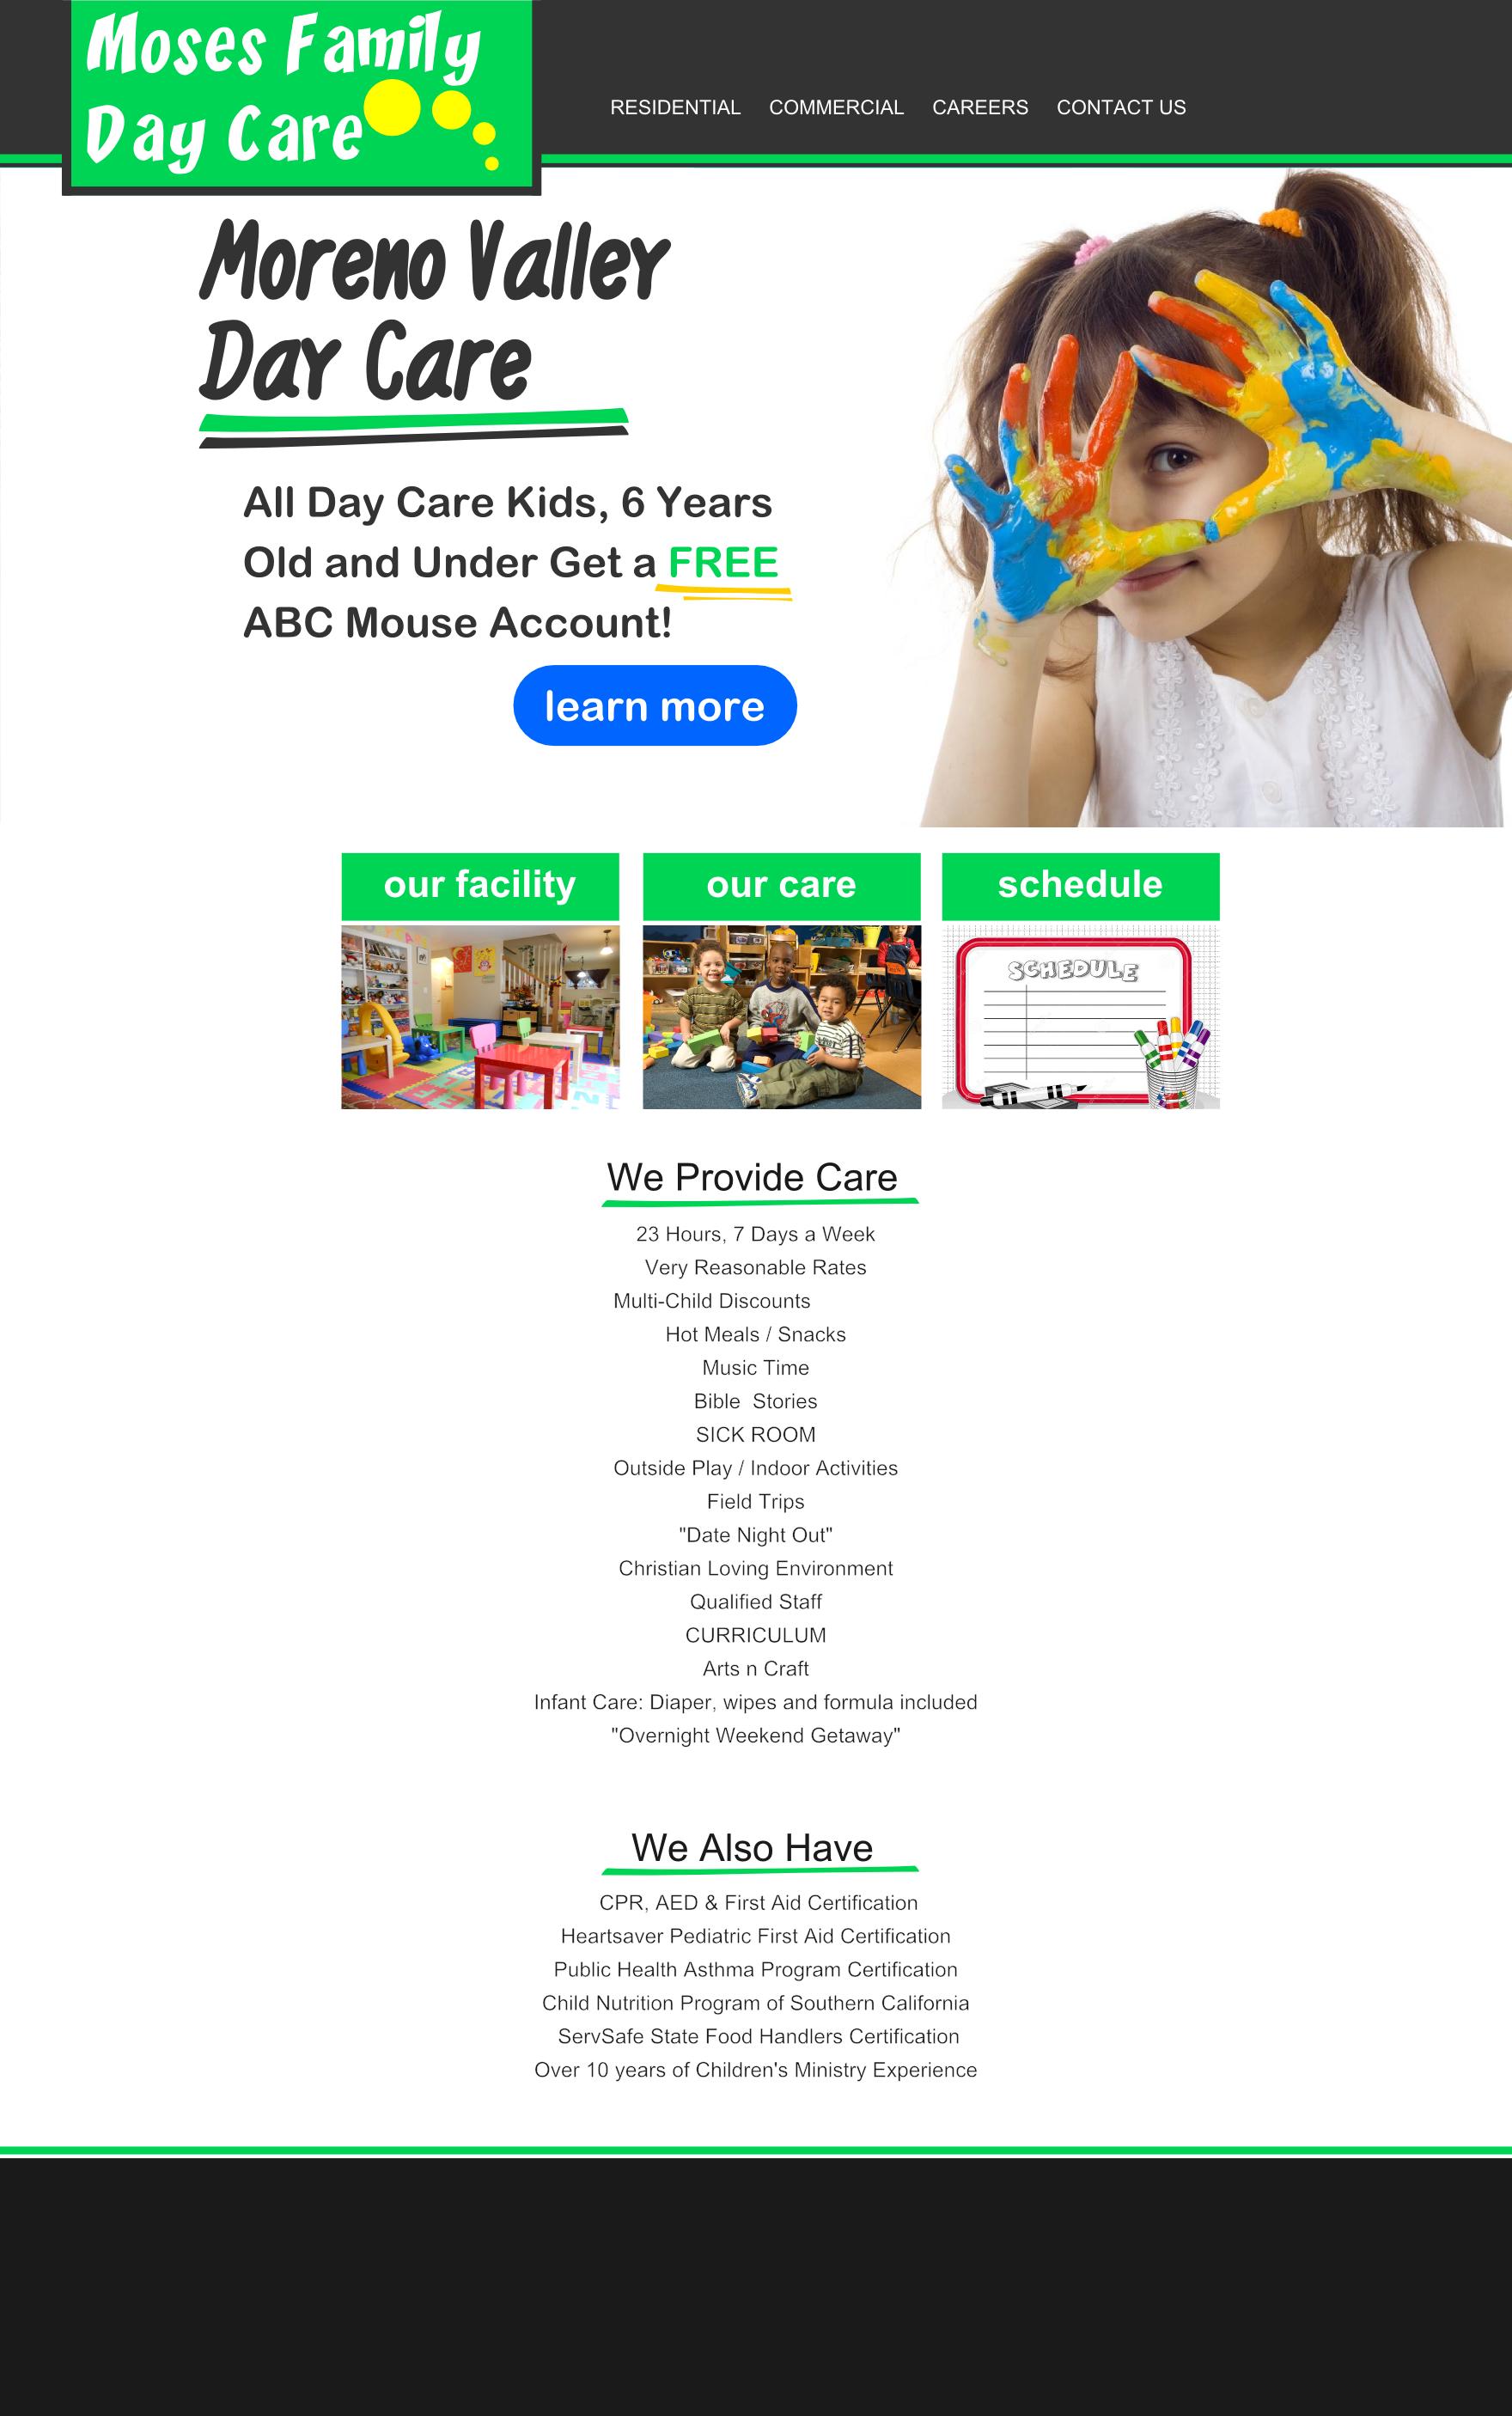 moses day care web design mockup